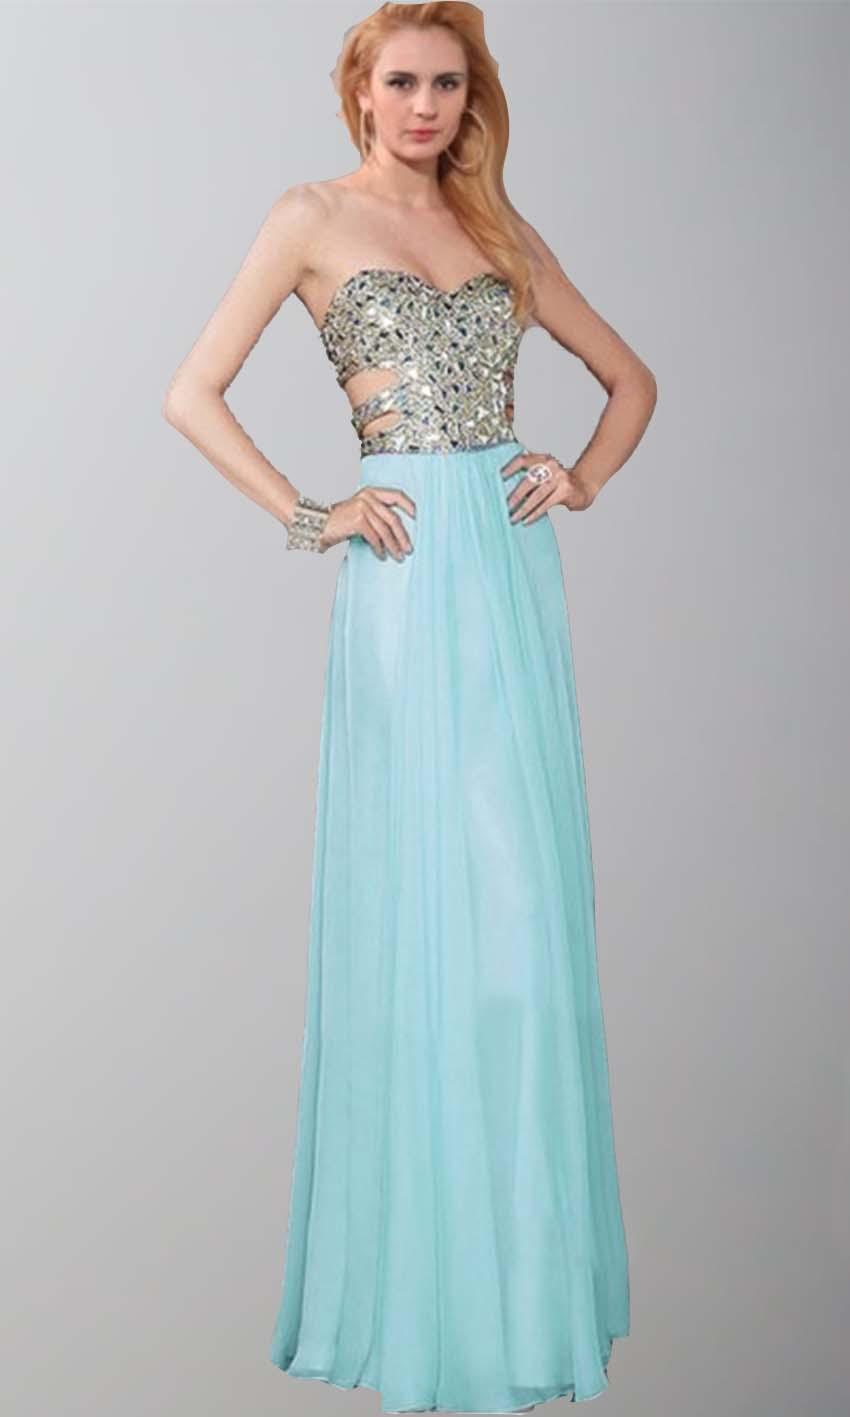 Cut Out Sweetheart Glitter Long Teal Prom Dresses UK KSP395 ...